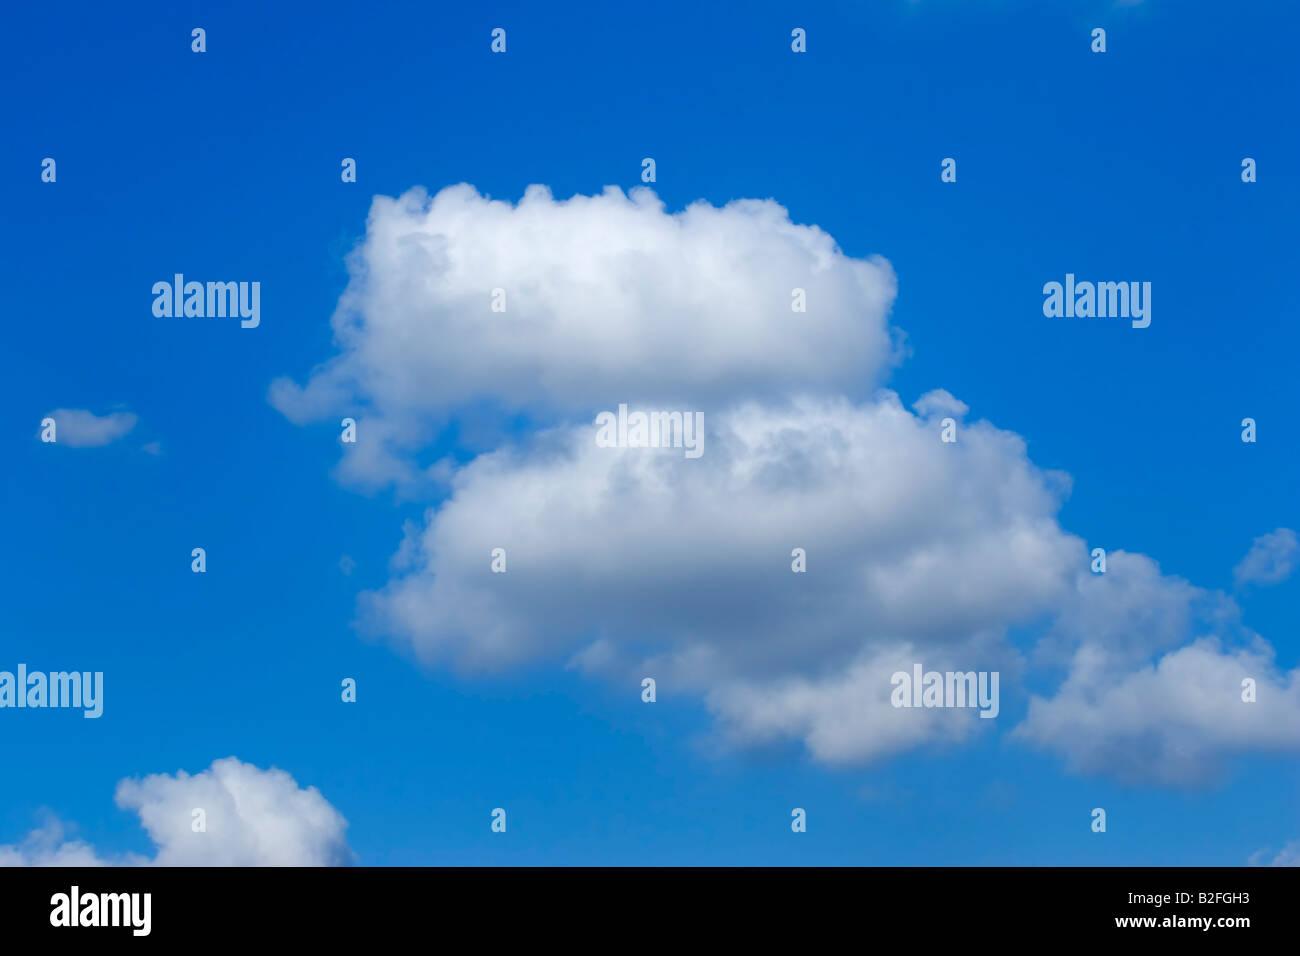 Les nuages blancs, ciel, bleu, le ciel, ciel, lumineux, Photo Stock